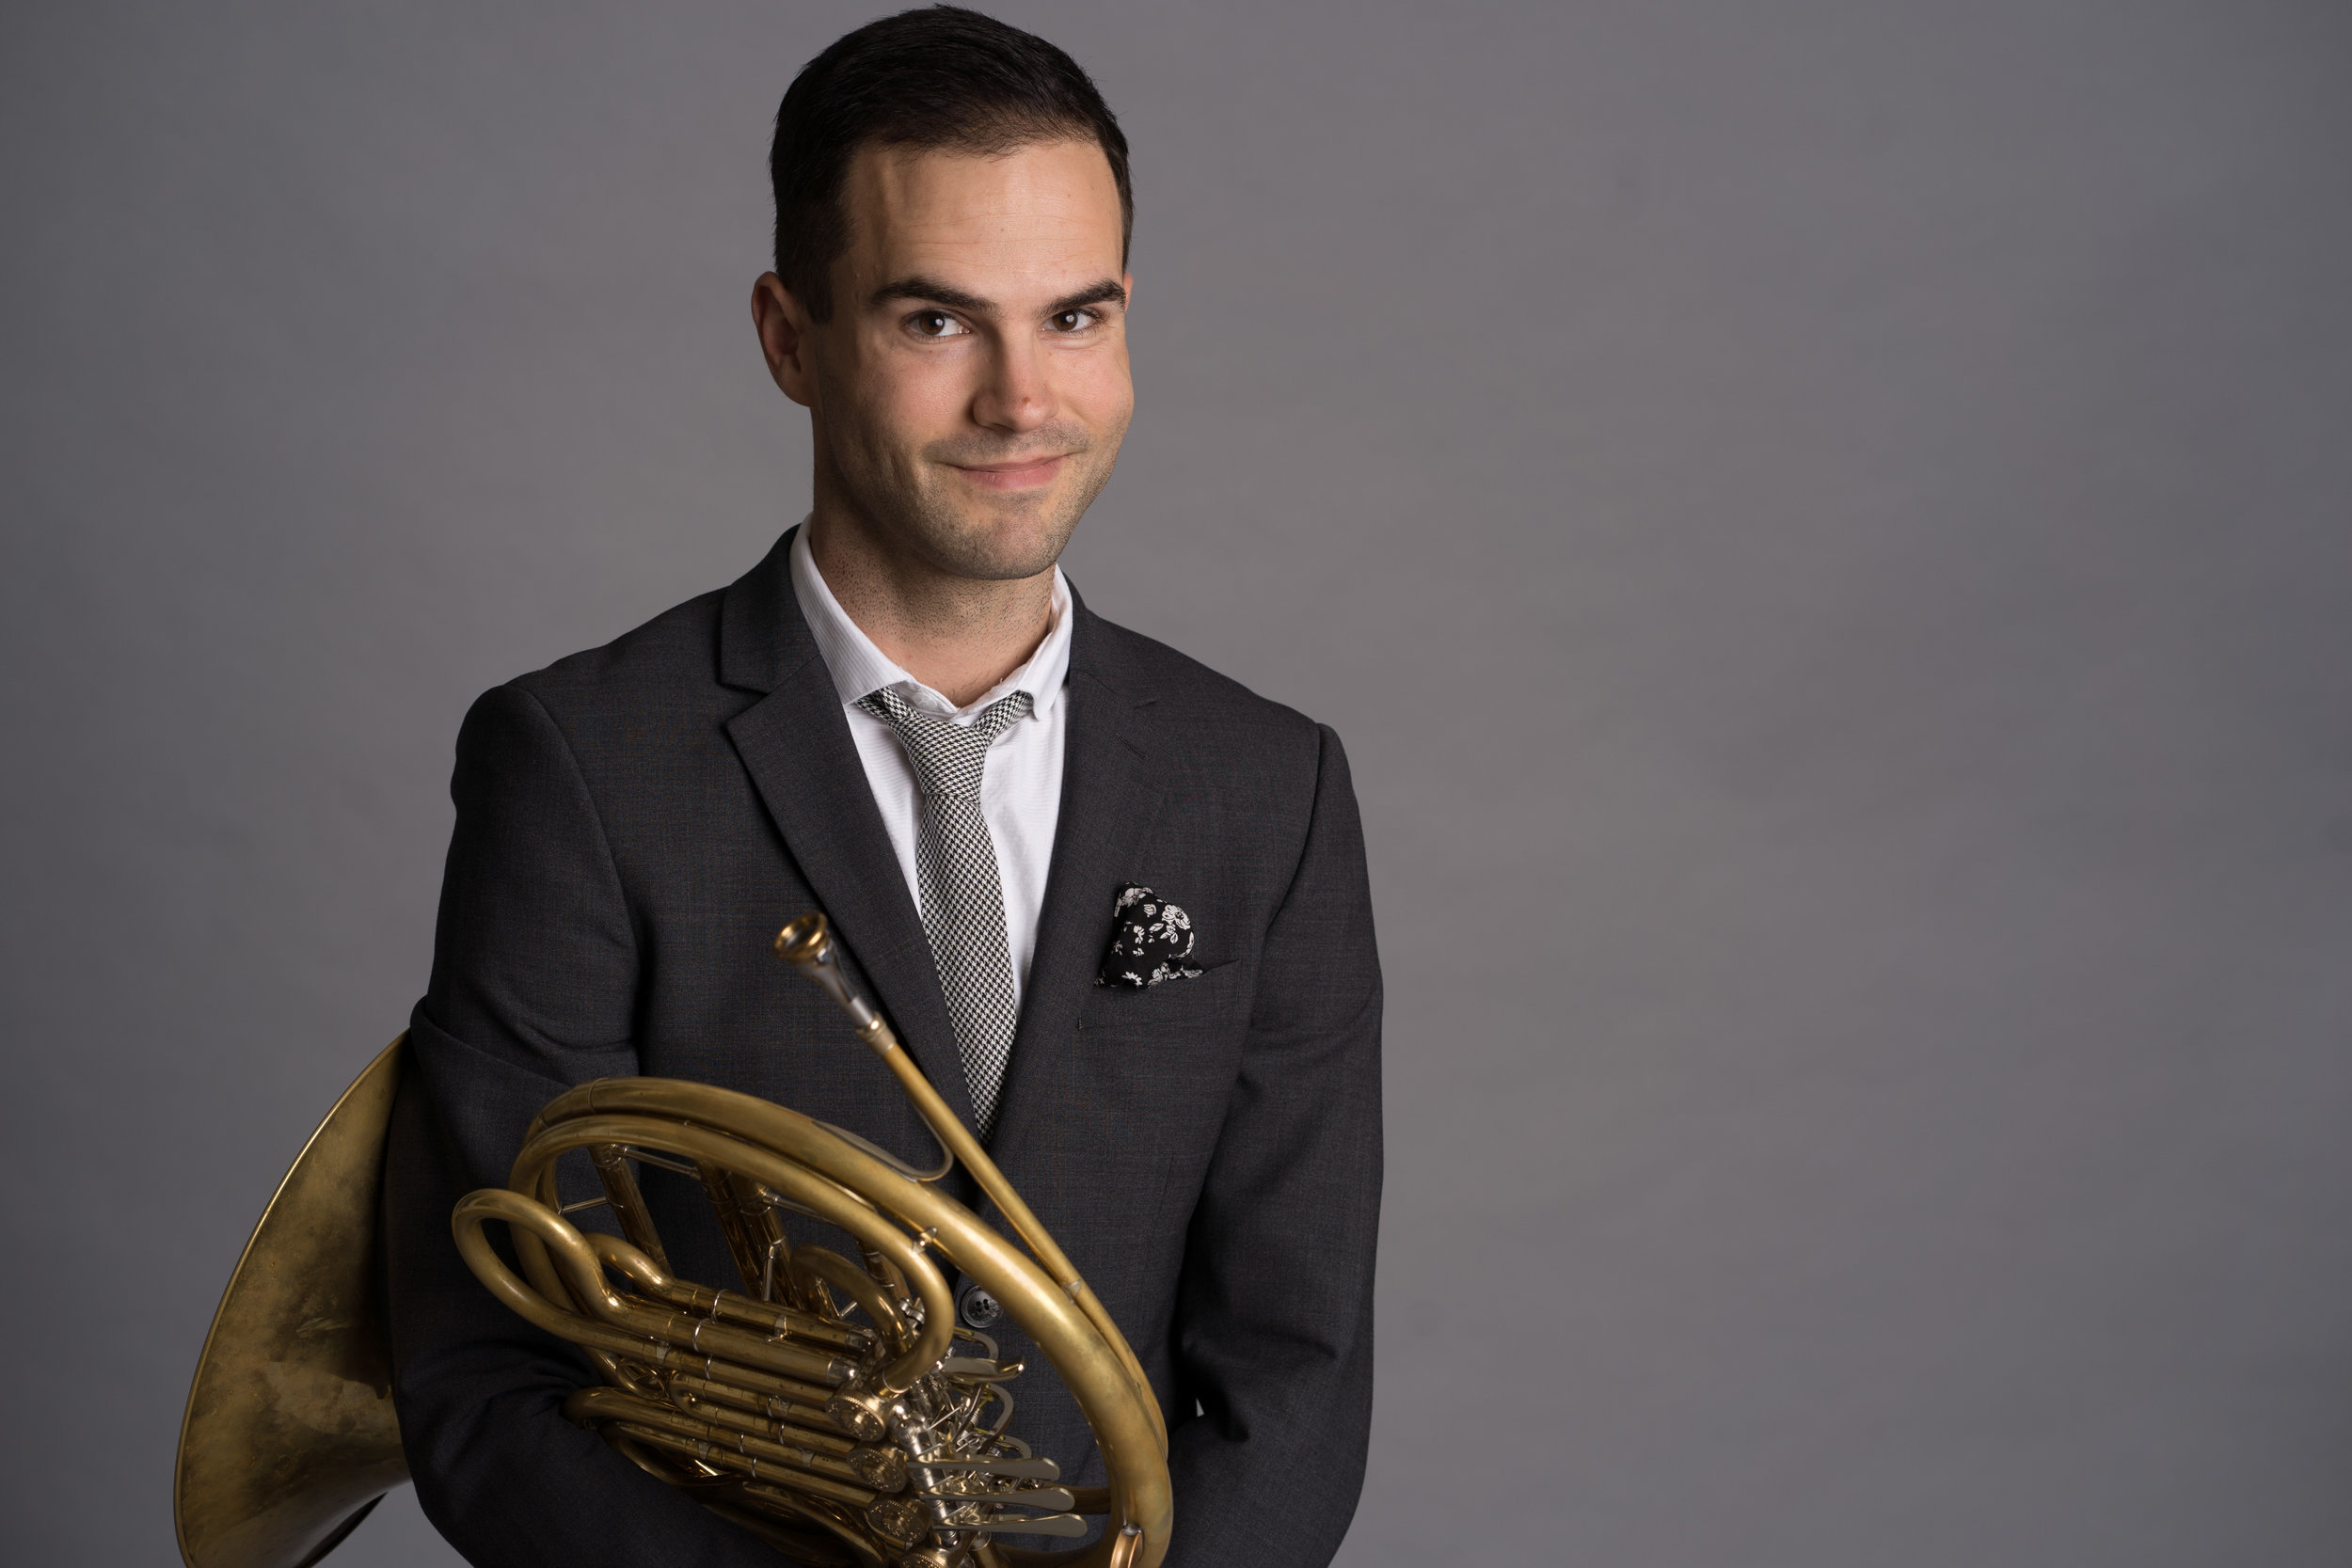 Patrick Jankowski, horn